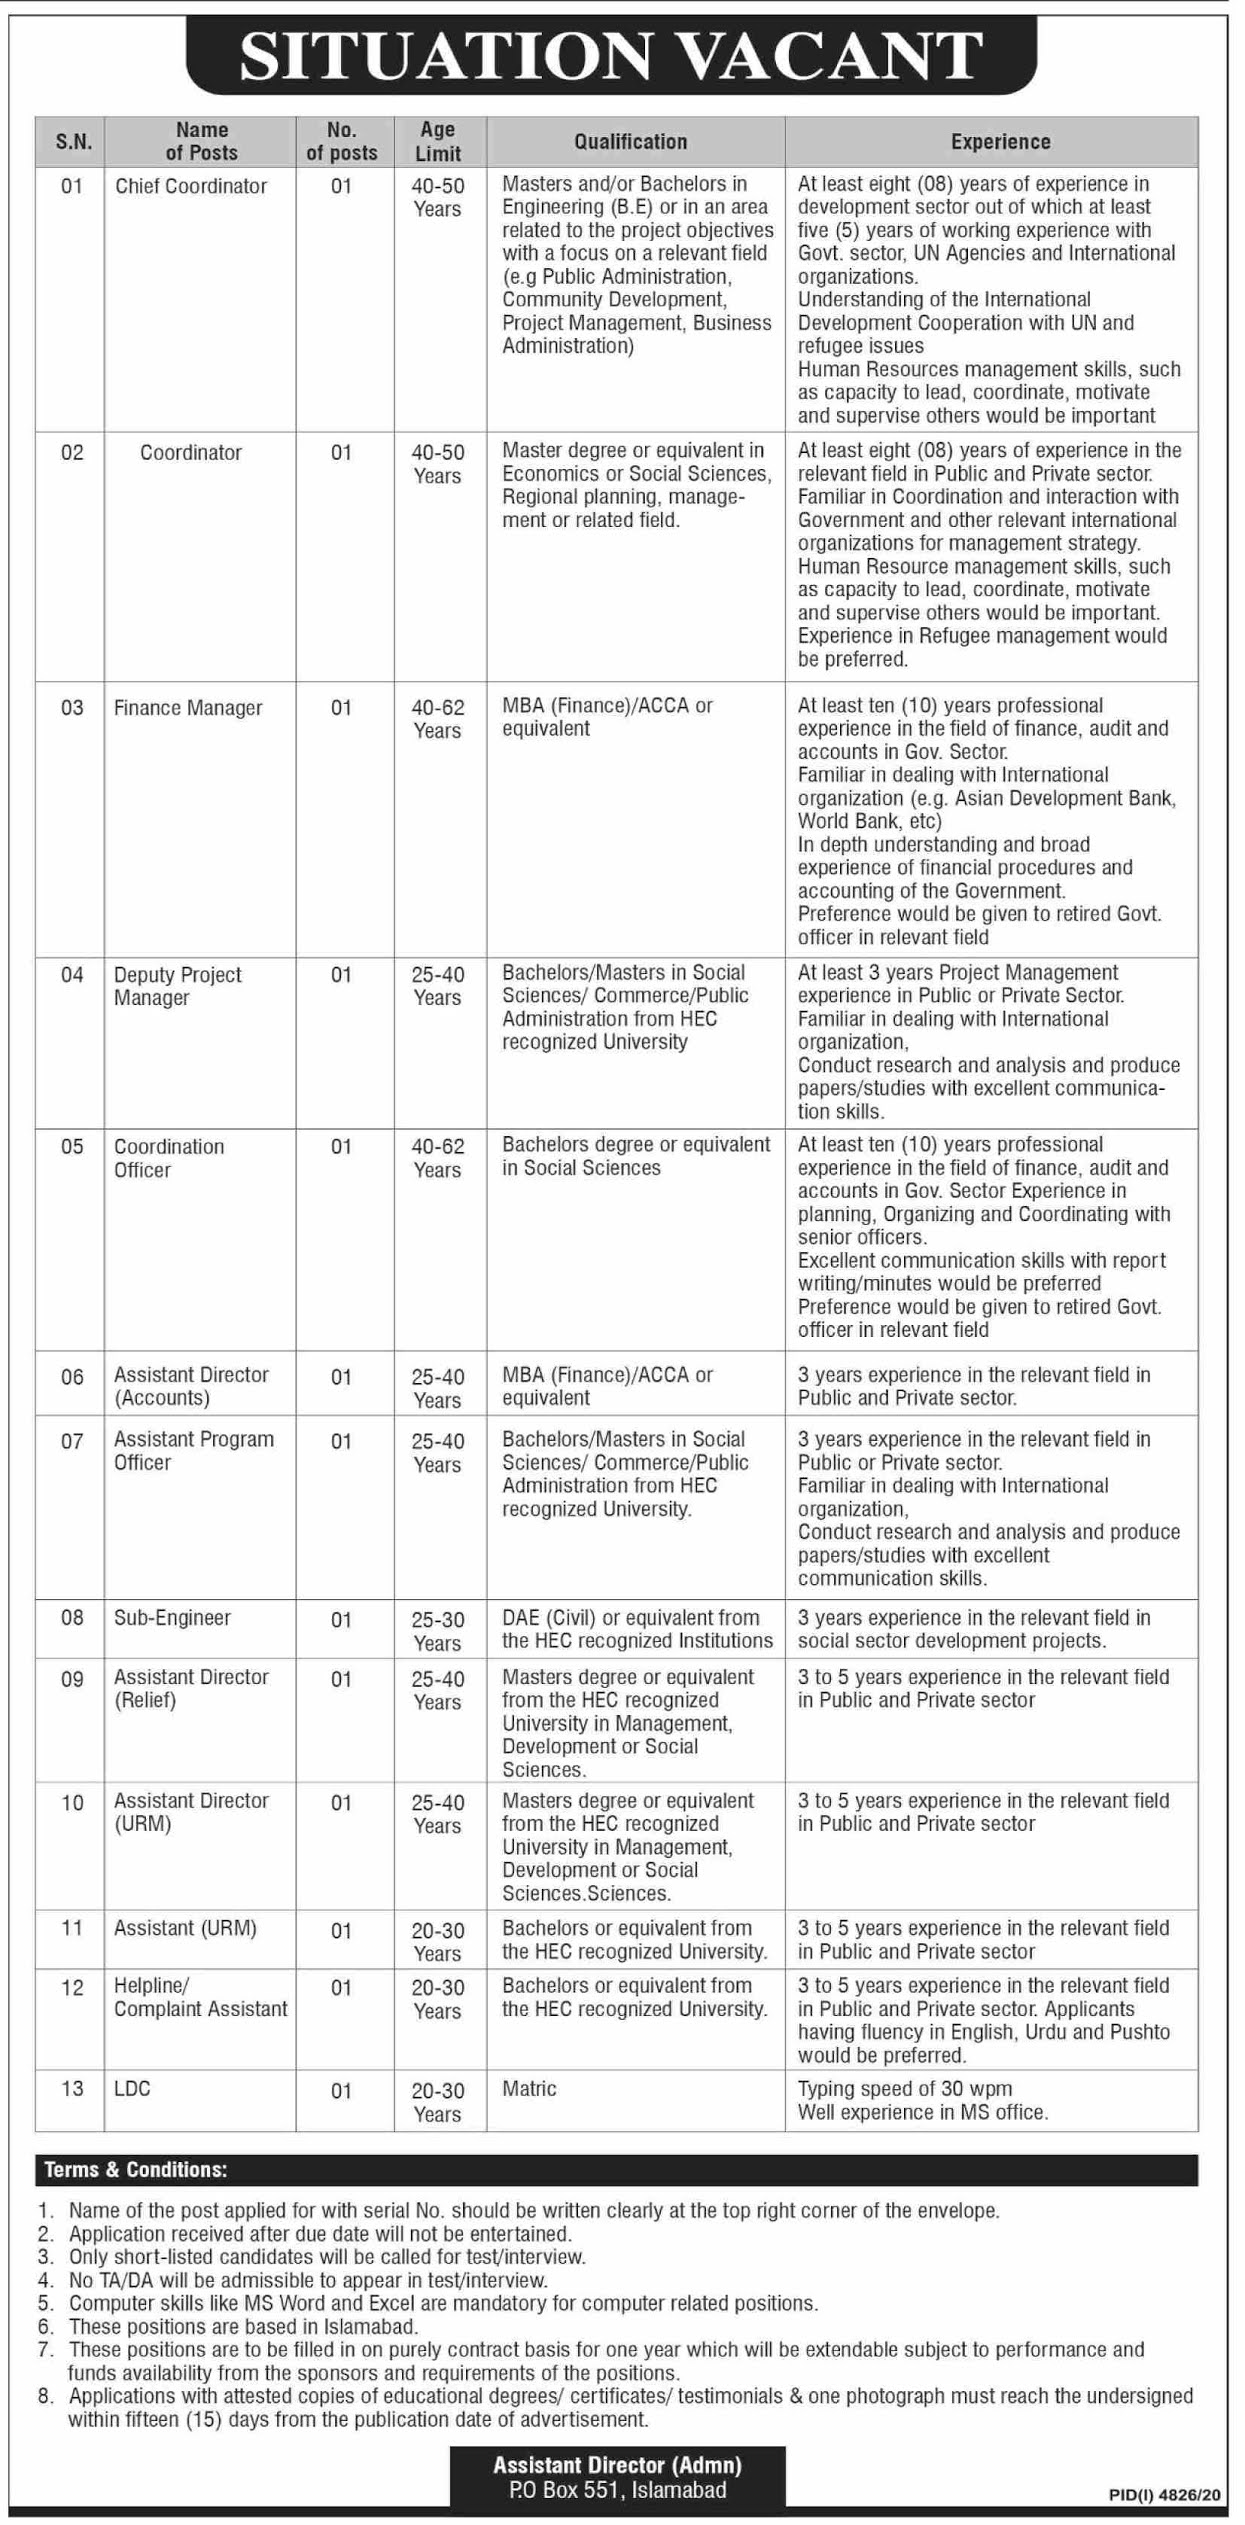 PO Box 551 Jobs 2021 - Public Sector Organization Jobs 2021 - Latest Govt Job Advertisement in Pakistan